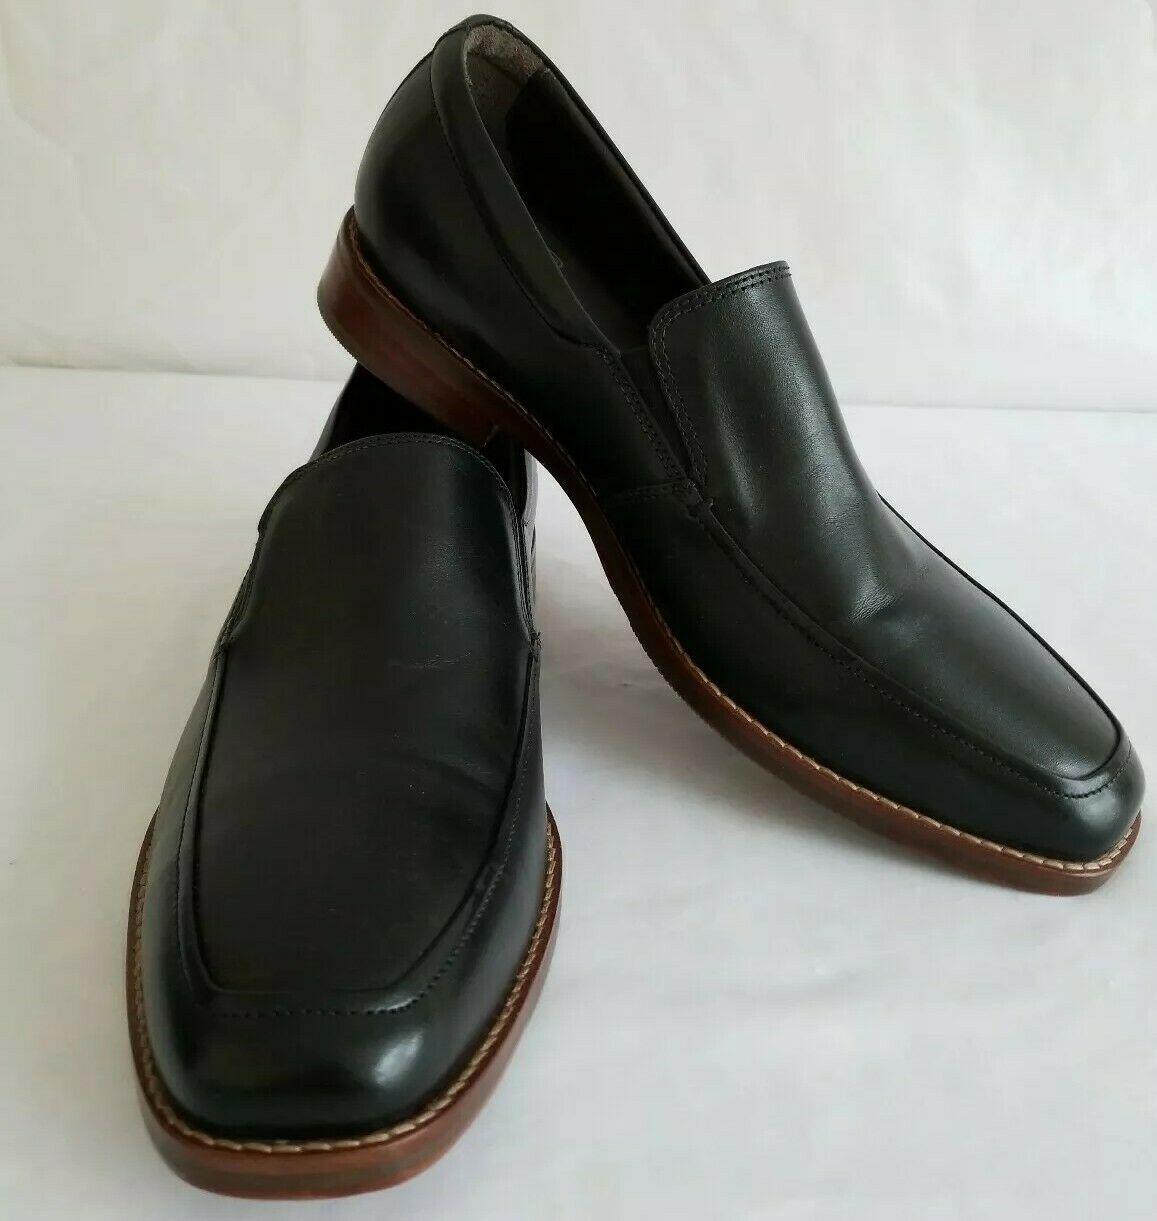 J&M 1850 Men's Black Calfskin Slip On Loafers US Size 10.5 M 70389